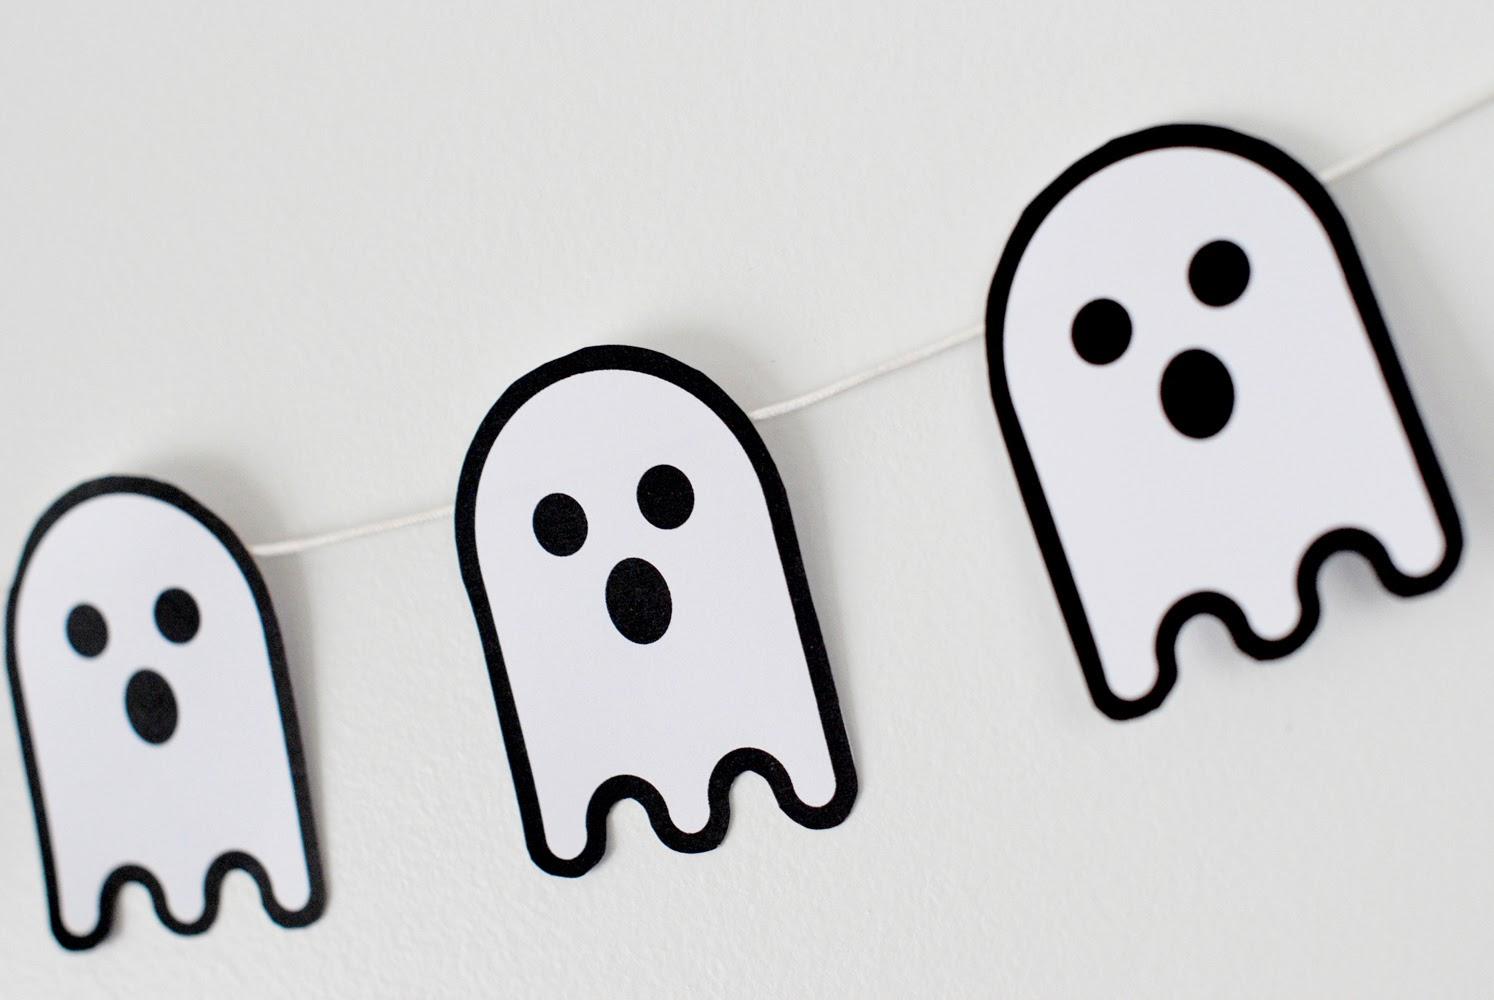 Stevensbloem leiden halloween versiering maken for Halloween versiering maken